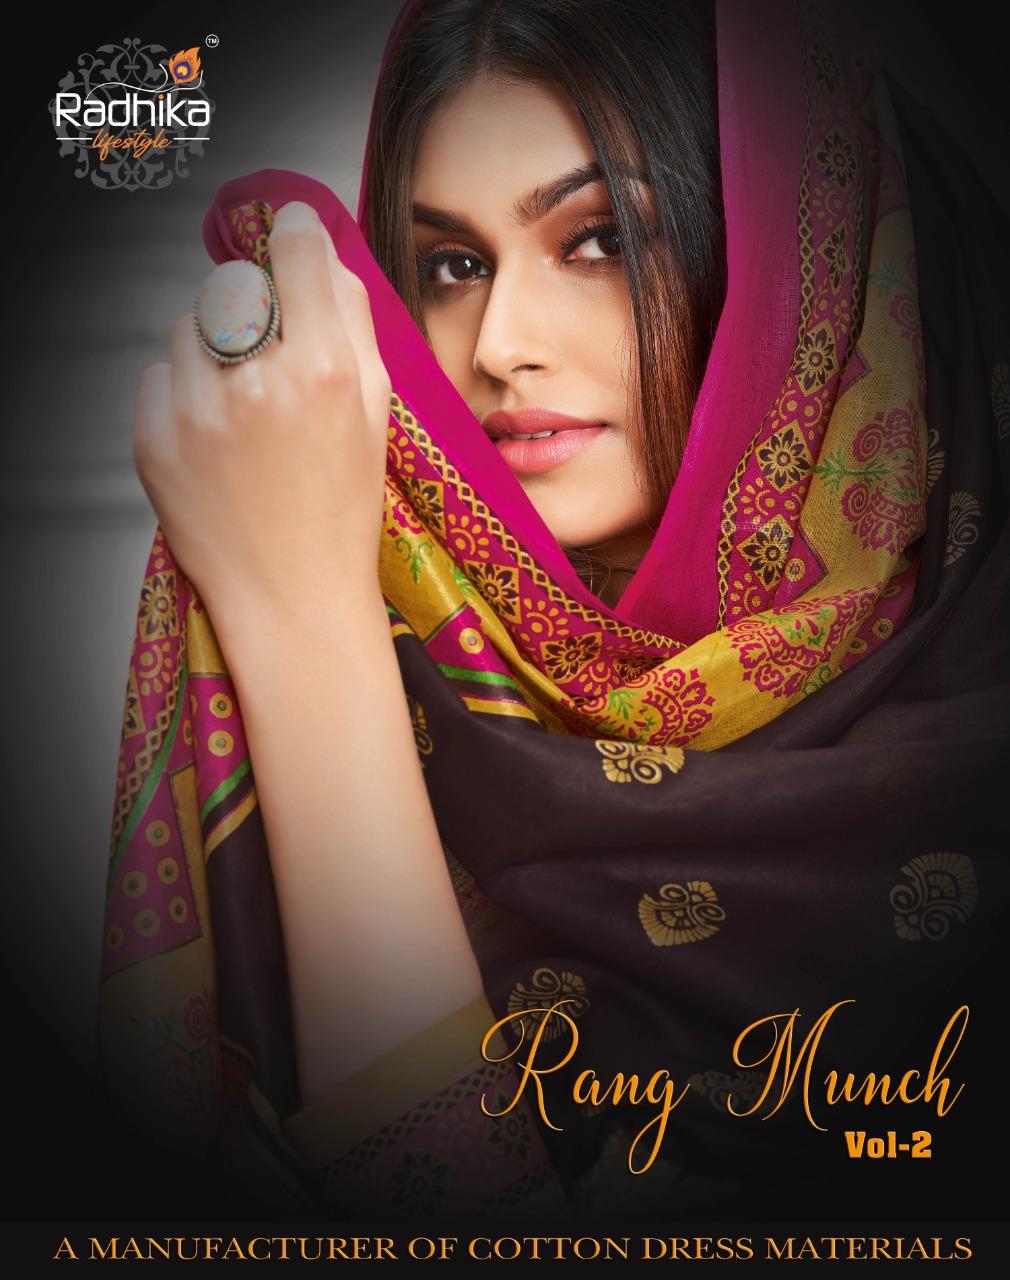 Radhika Rang Munch Vol-2 Series 2001-2012 Pure Cotton Suit